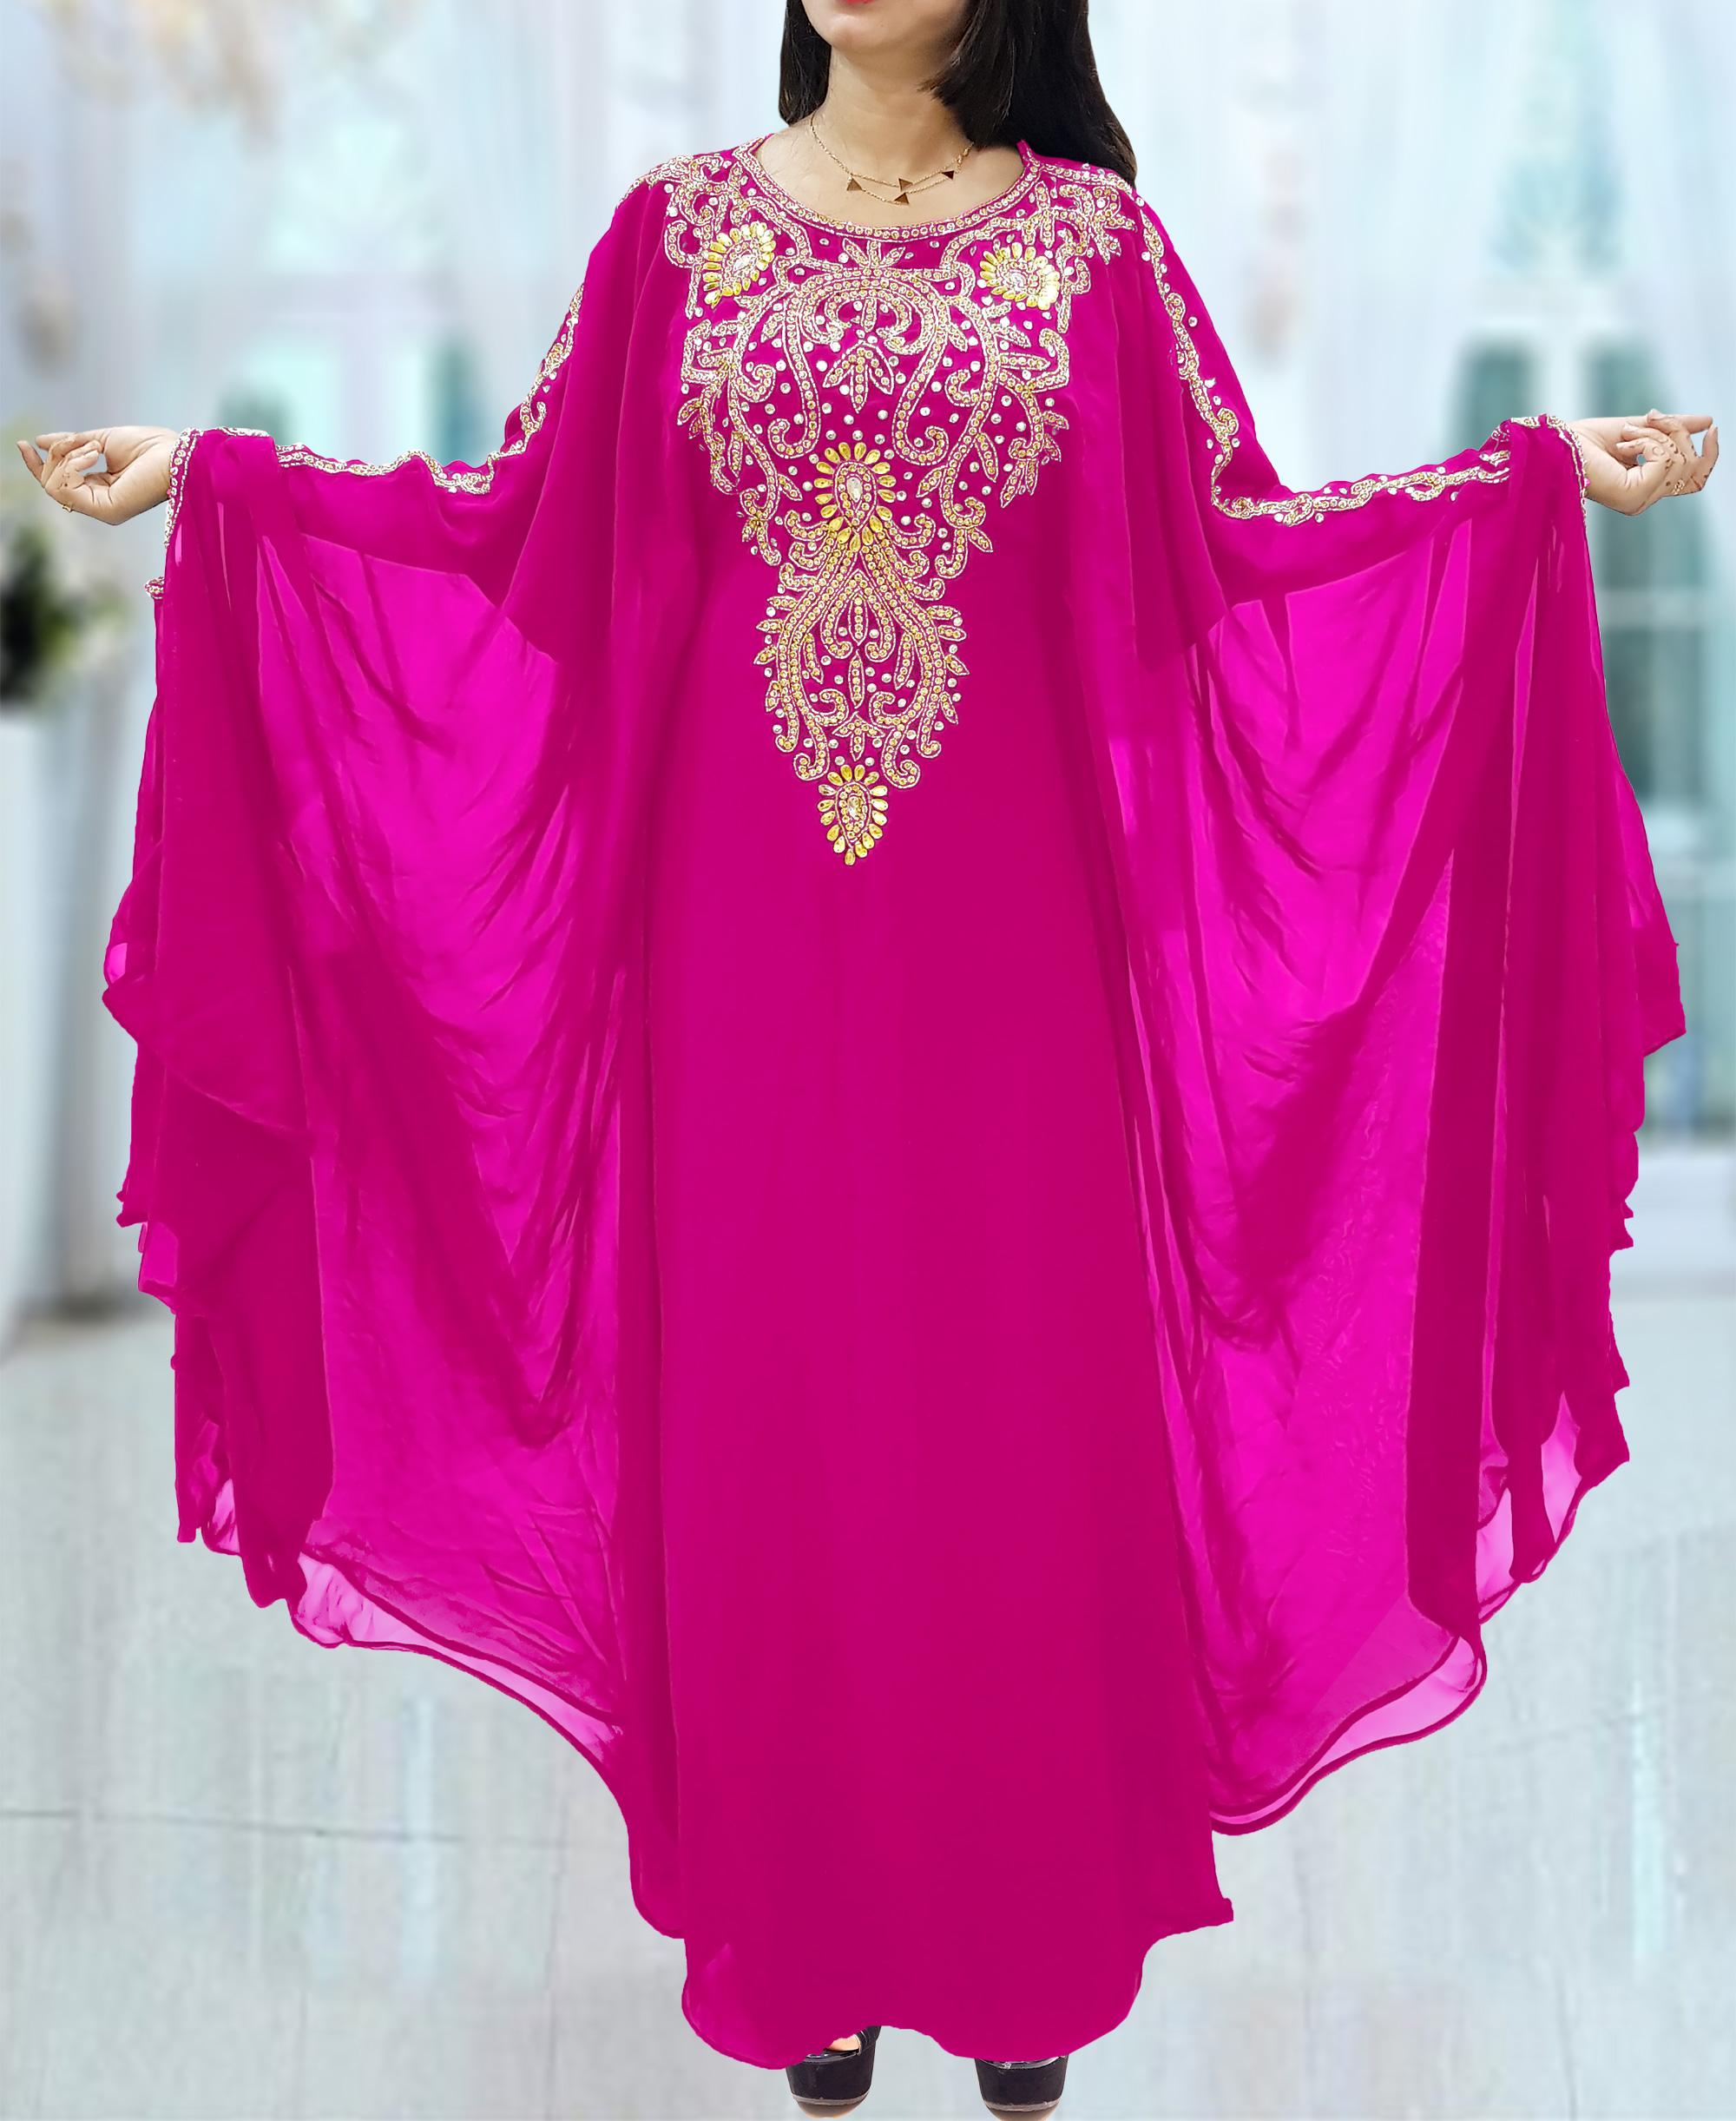 Kaftan Dress Picture Collection | DressedUpGirl.com